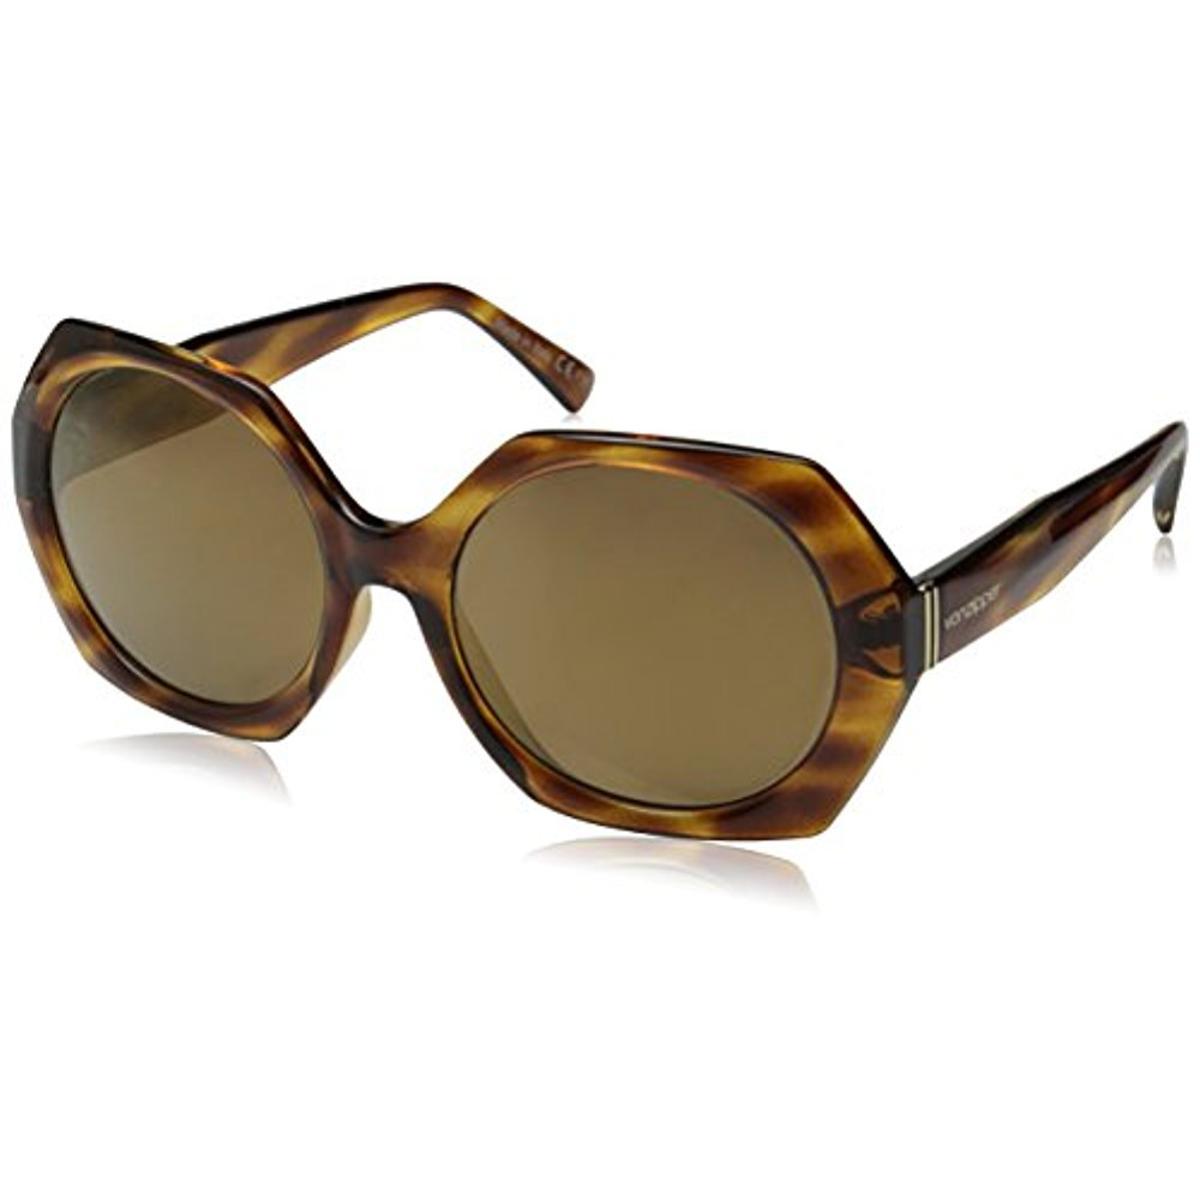 VonZipper Womens Buelah Tortoise Gradient Round Sunglasses 6370475